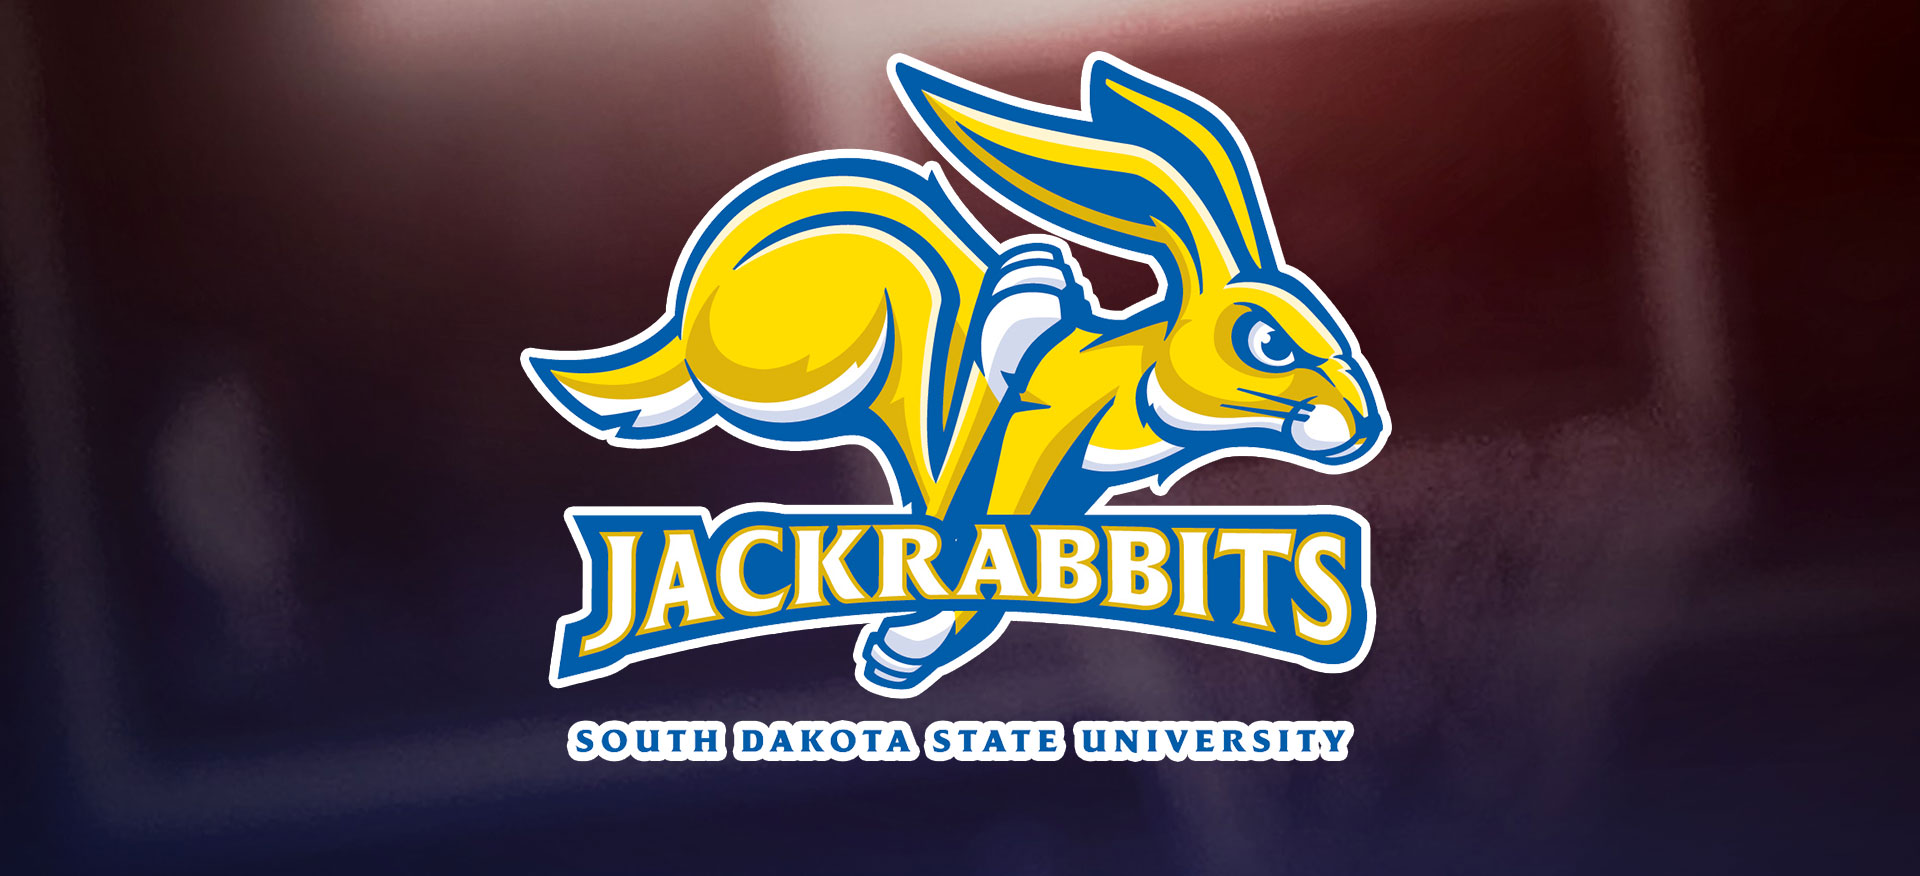 SDSU South Dakota State University Jackrabbits SDSU Jackrabbits SDSU Jacks